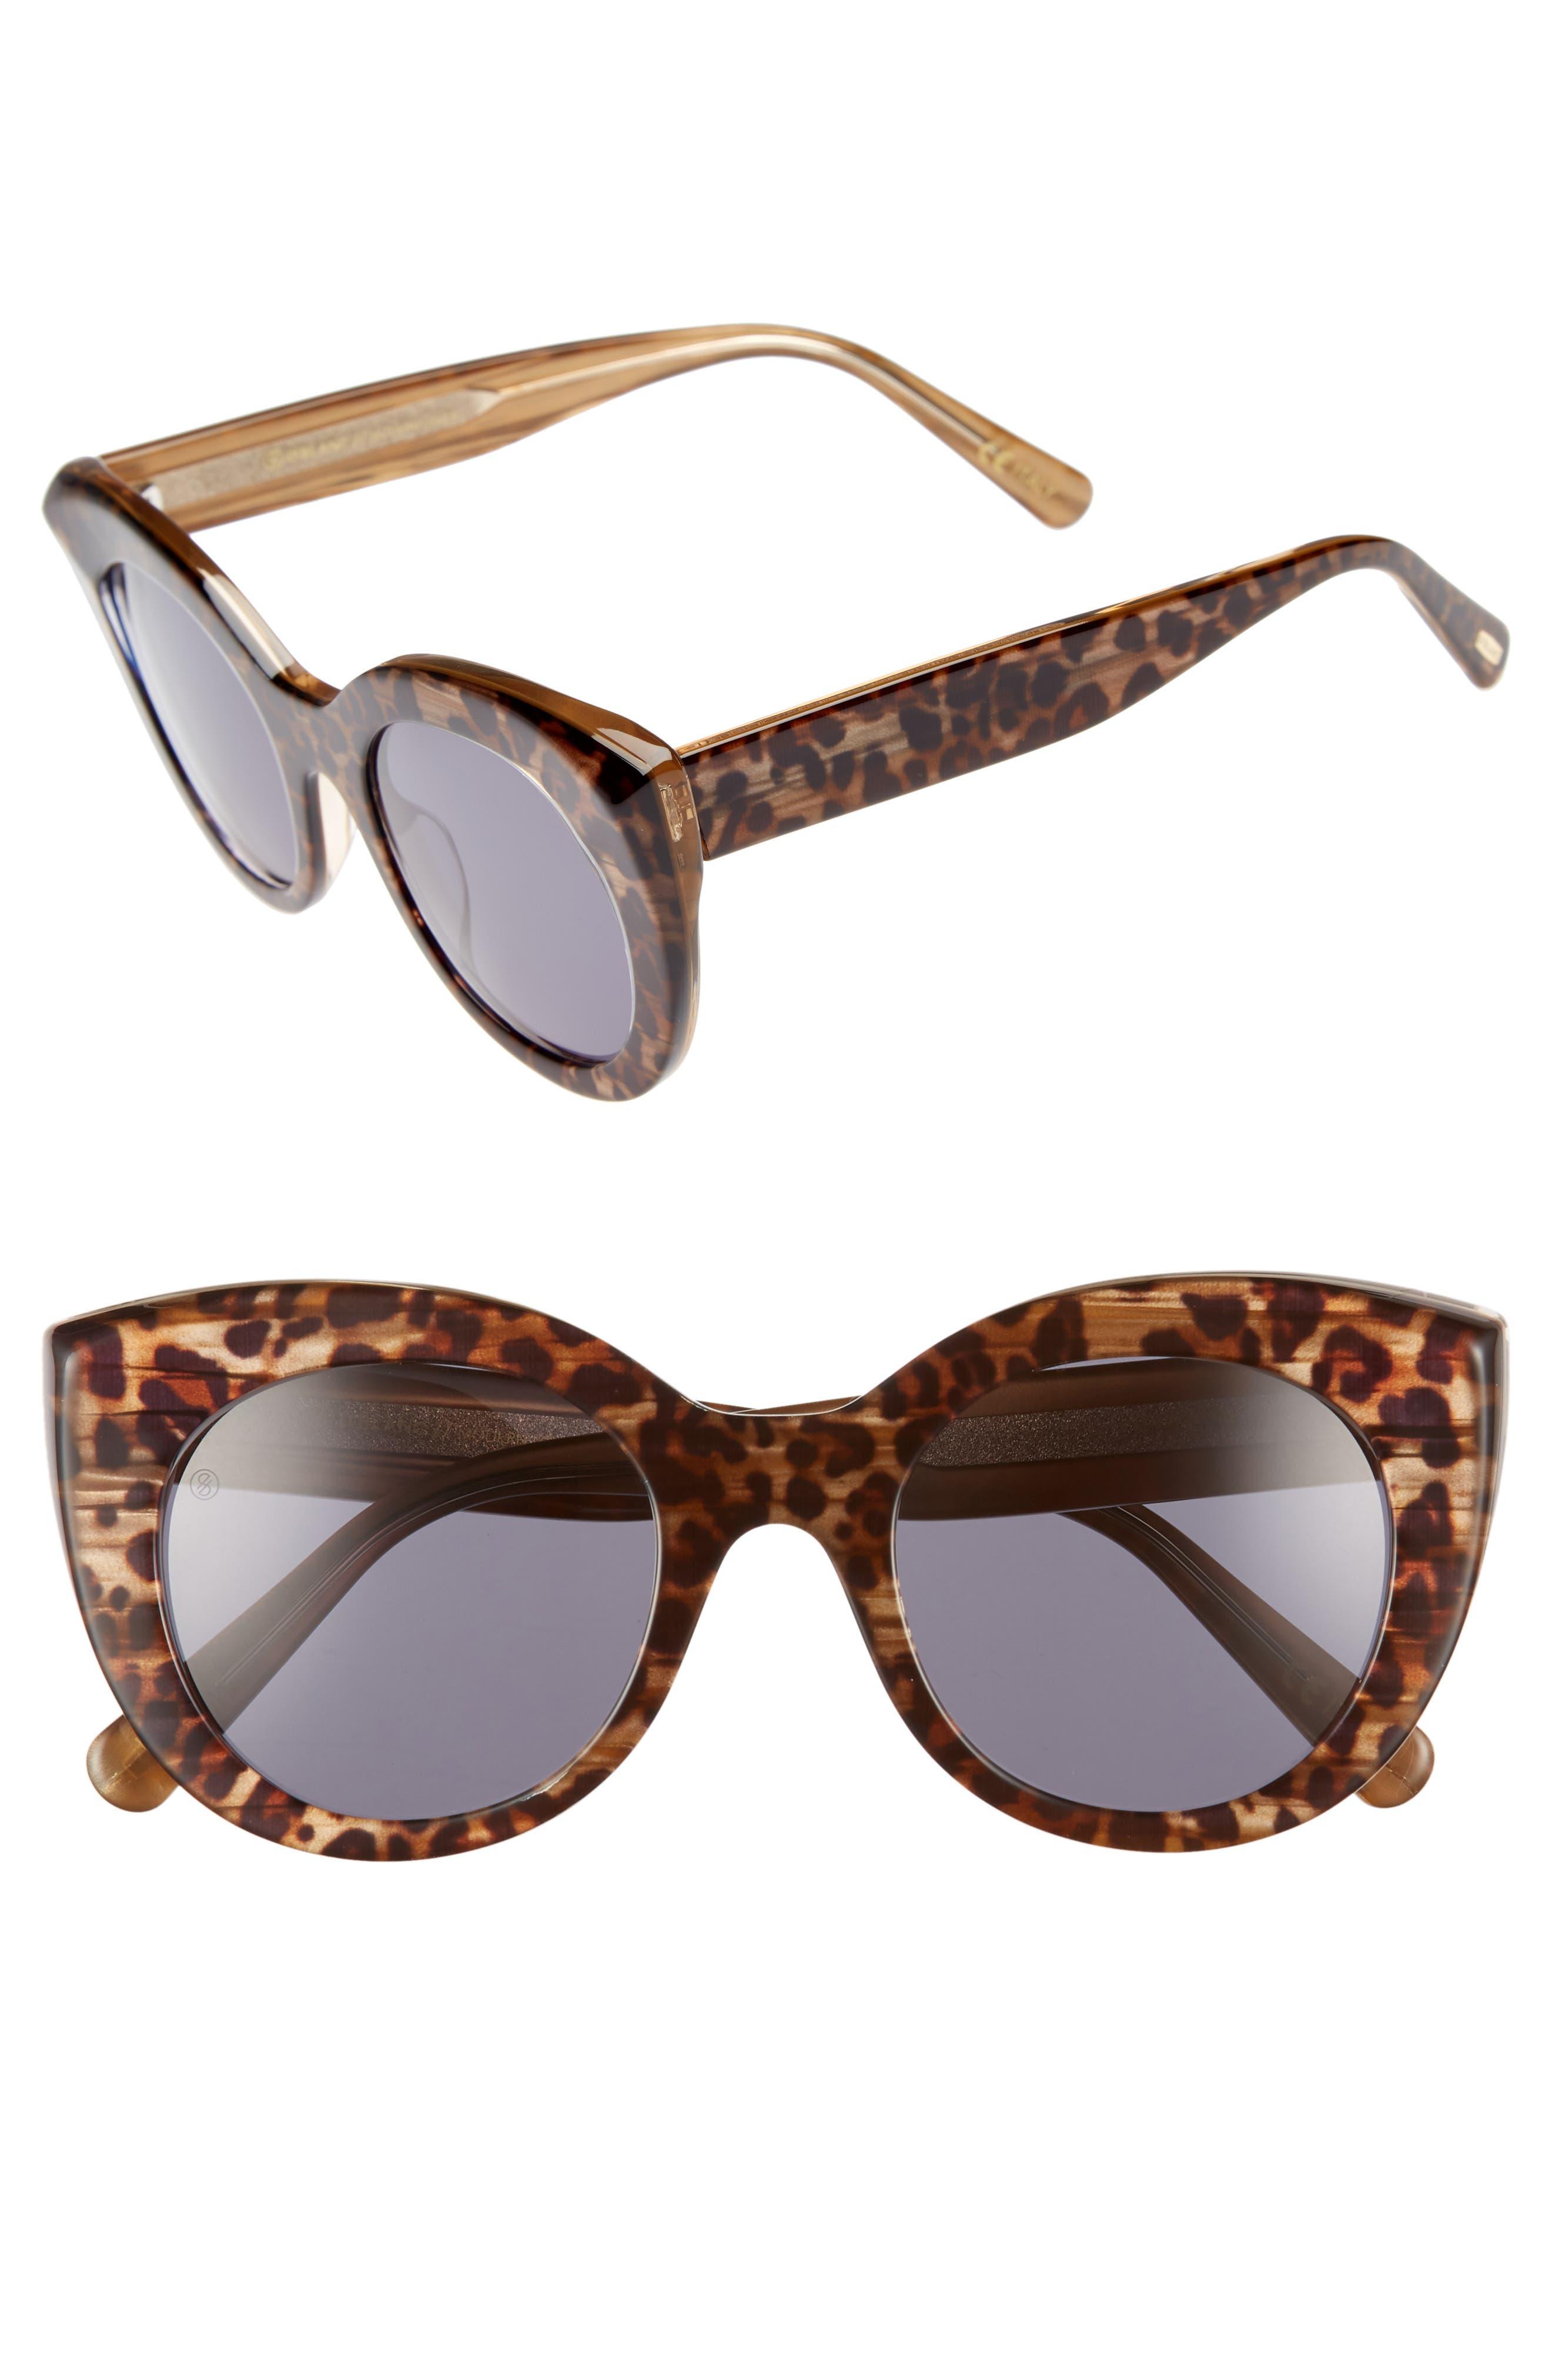 D'BLANC x Amuse Society Modern Lover 51mm Cat Eye Sunglasses,                             Main thumbnail 1, color,                             Cheetah/ Grey